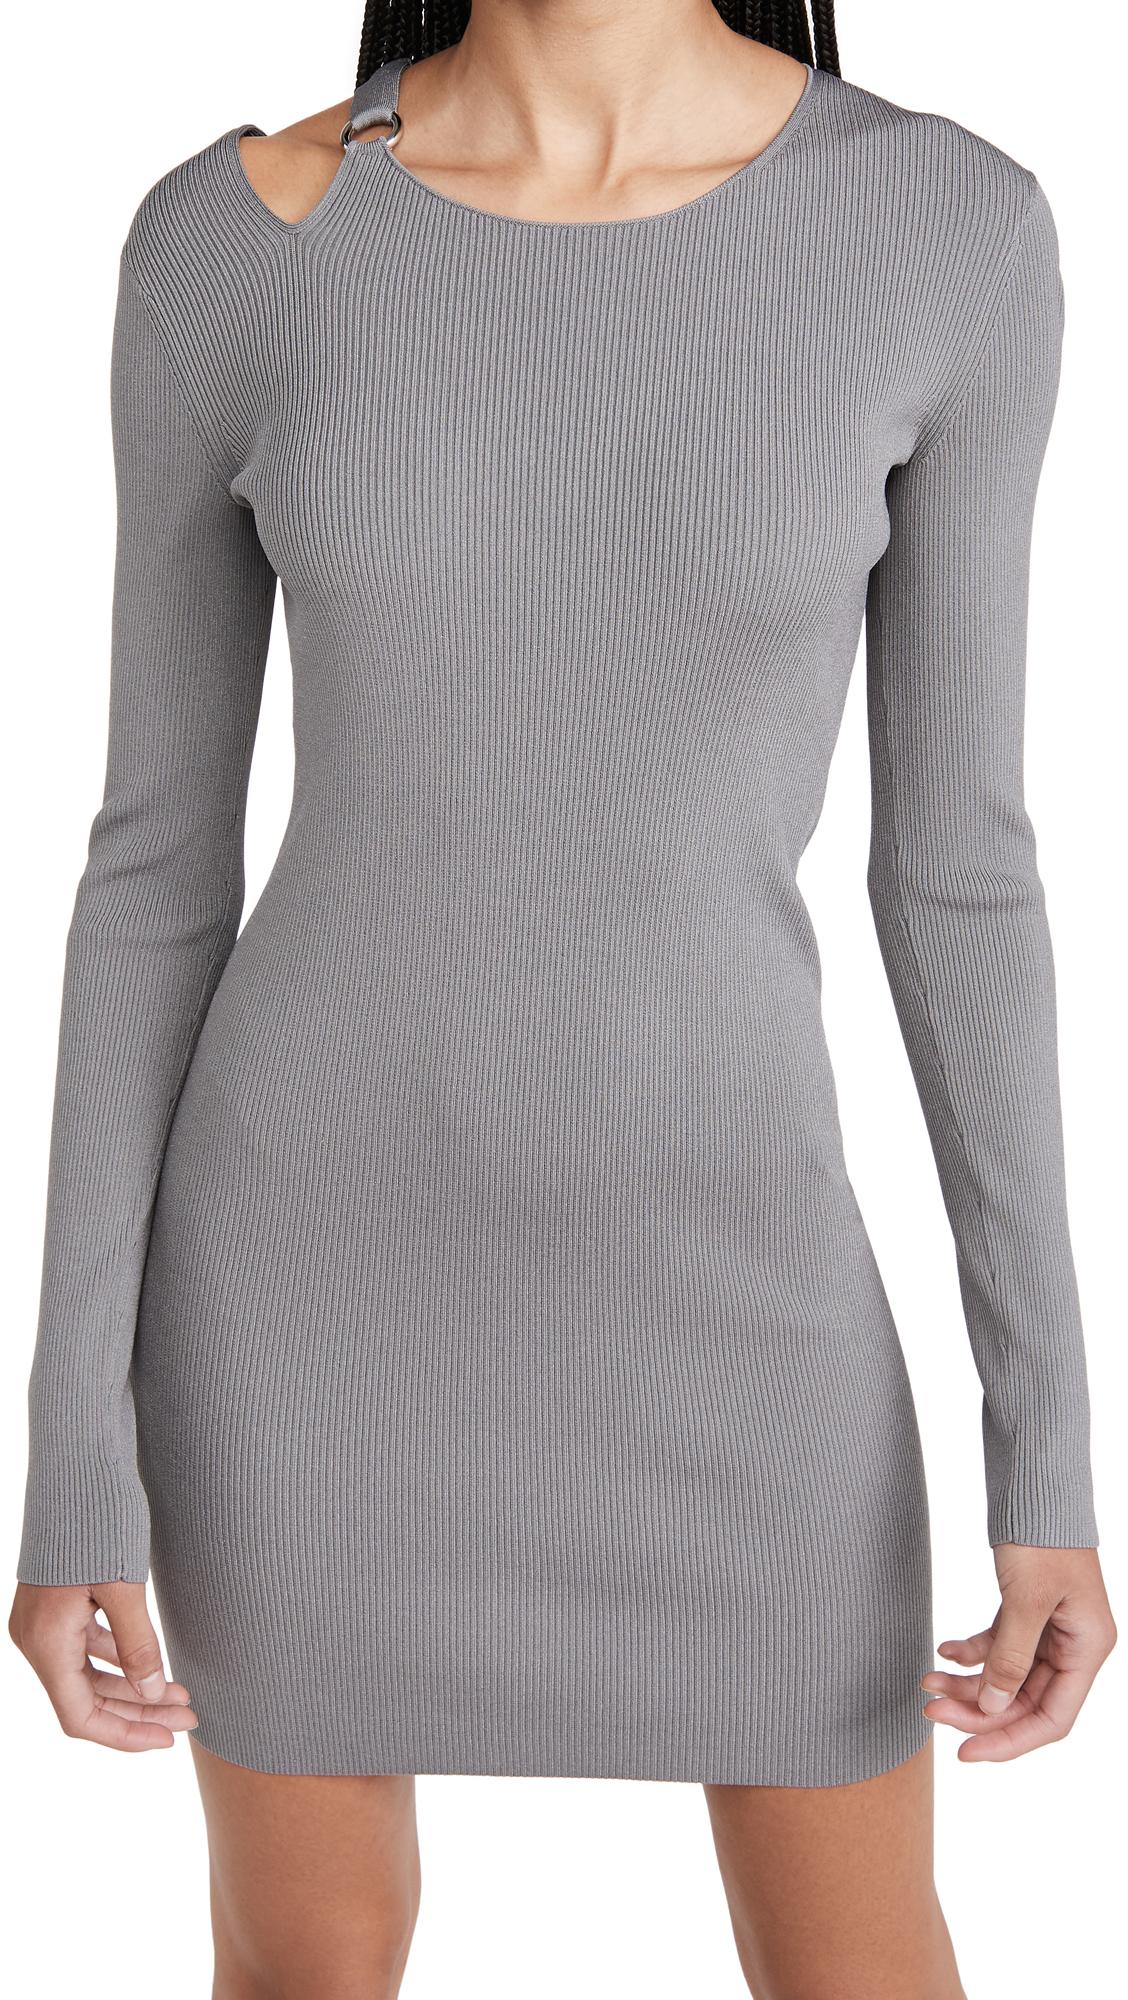 Helmut Lang Ring Dress